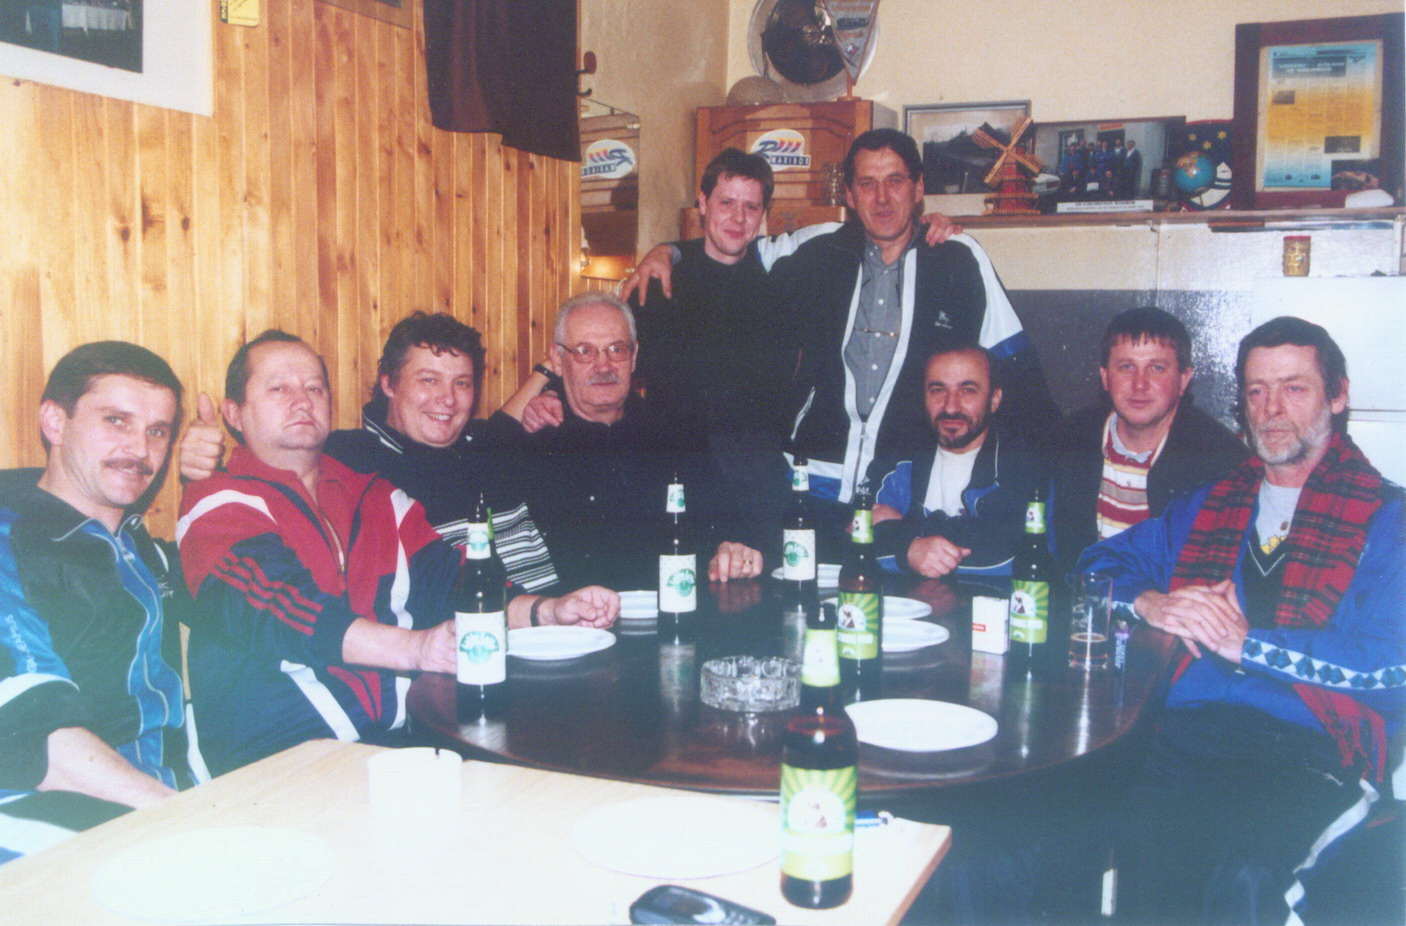 2. ekipa v 3. Slo ligi, 2001/02